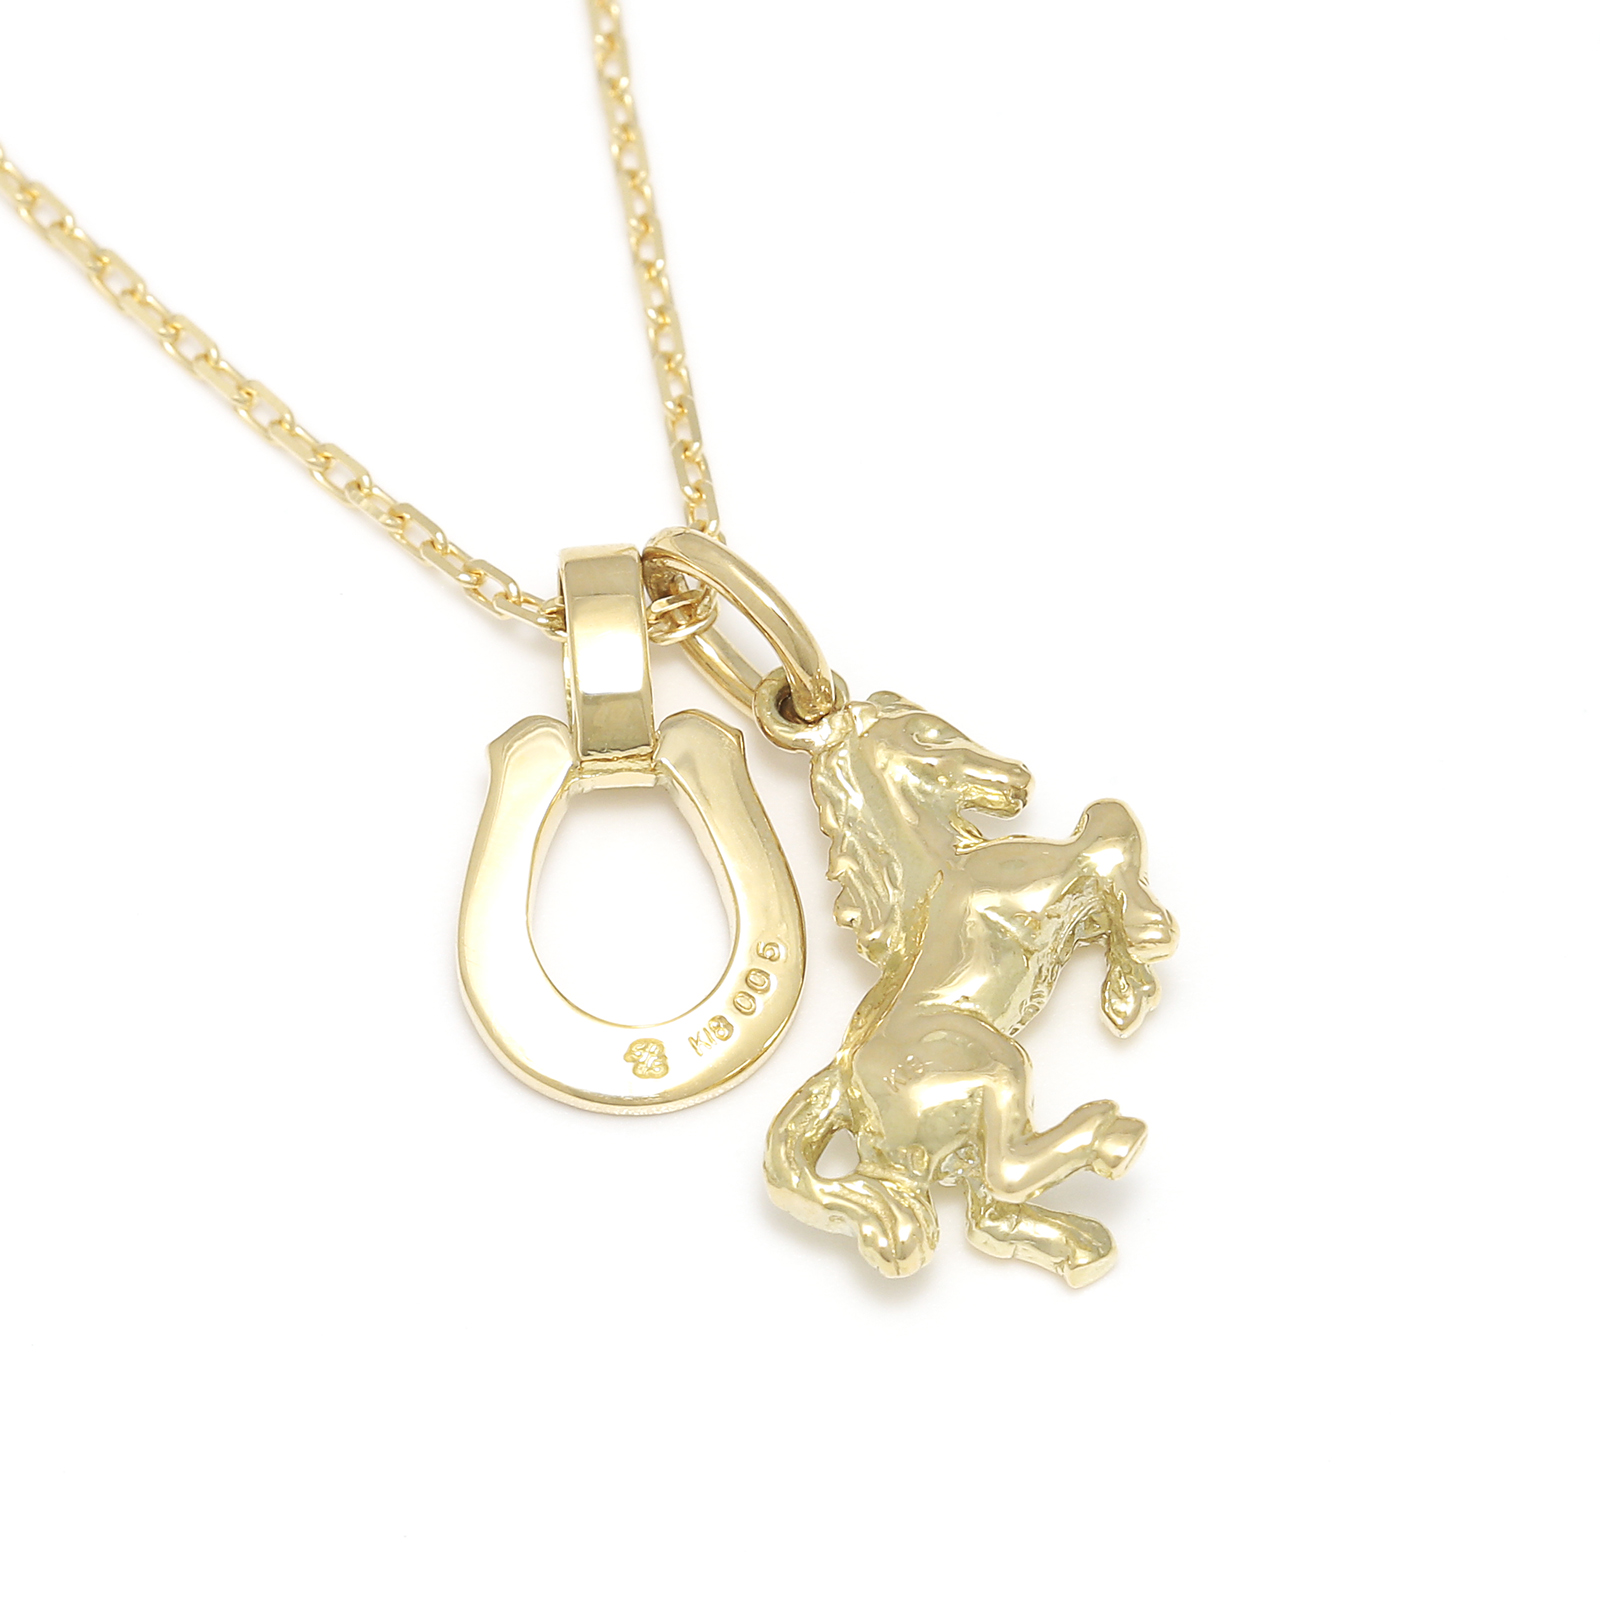 Small Horse & Horseshoe Necklace - K18Yellow Gold w/Diamond